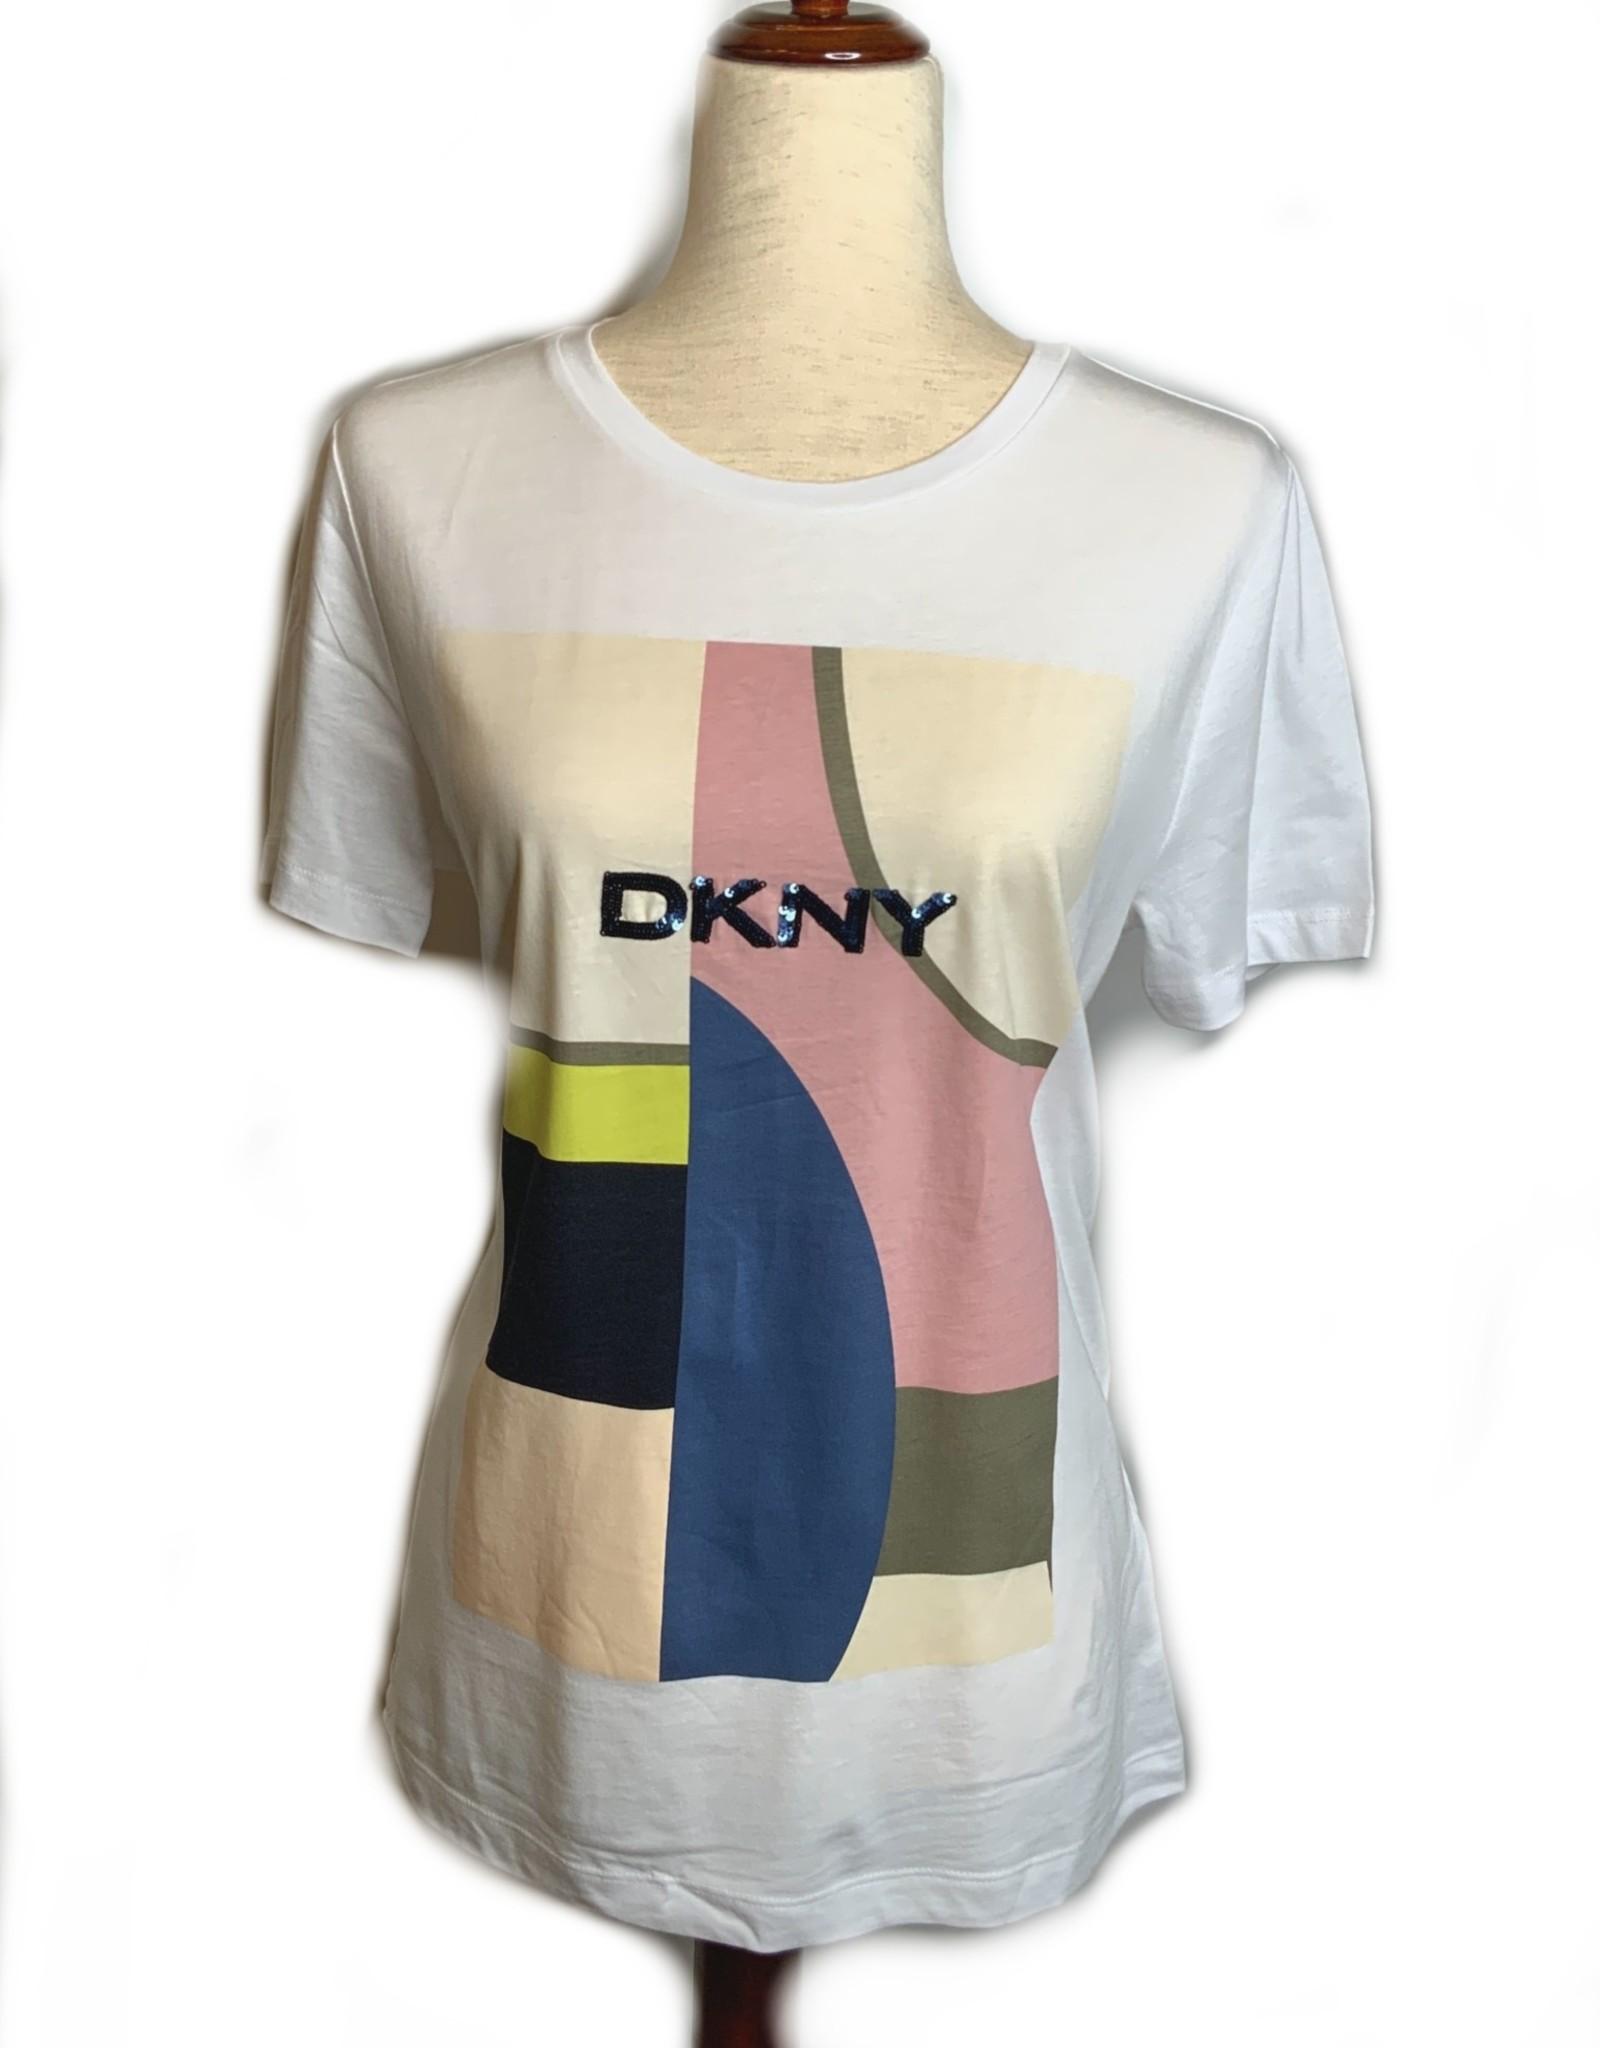 DKNY DKNY Tees Sequined Printed Logo